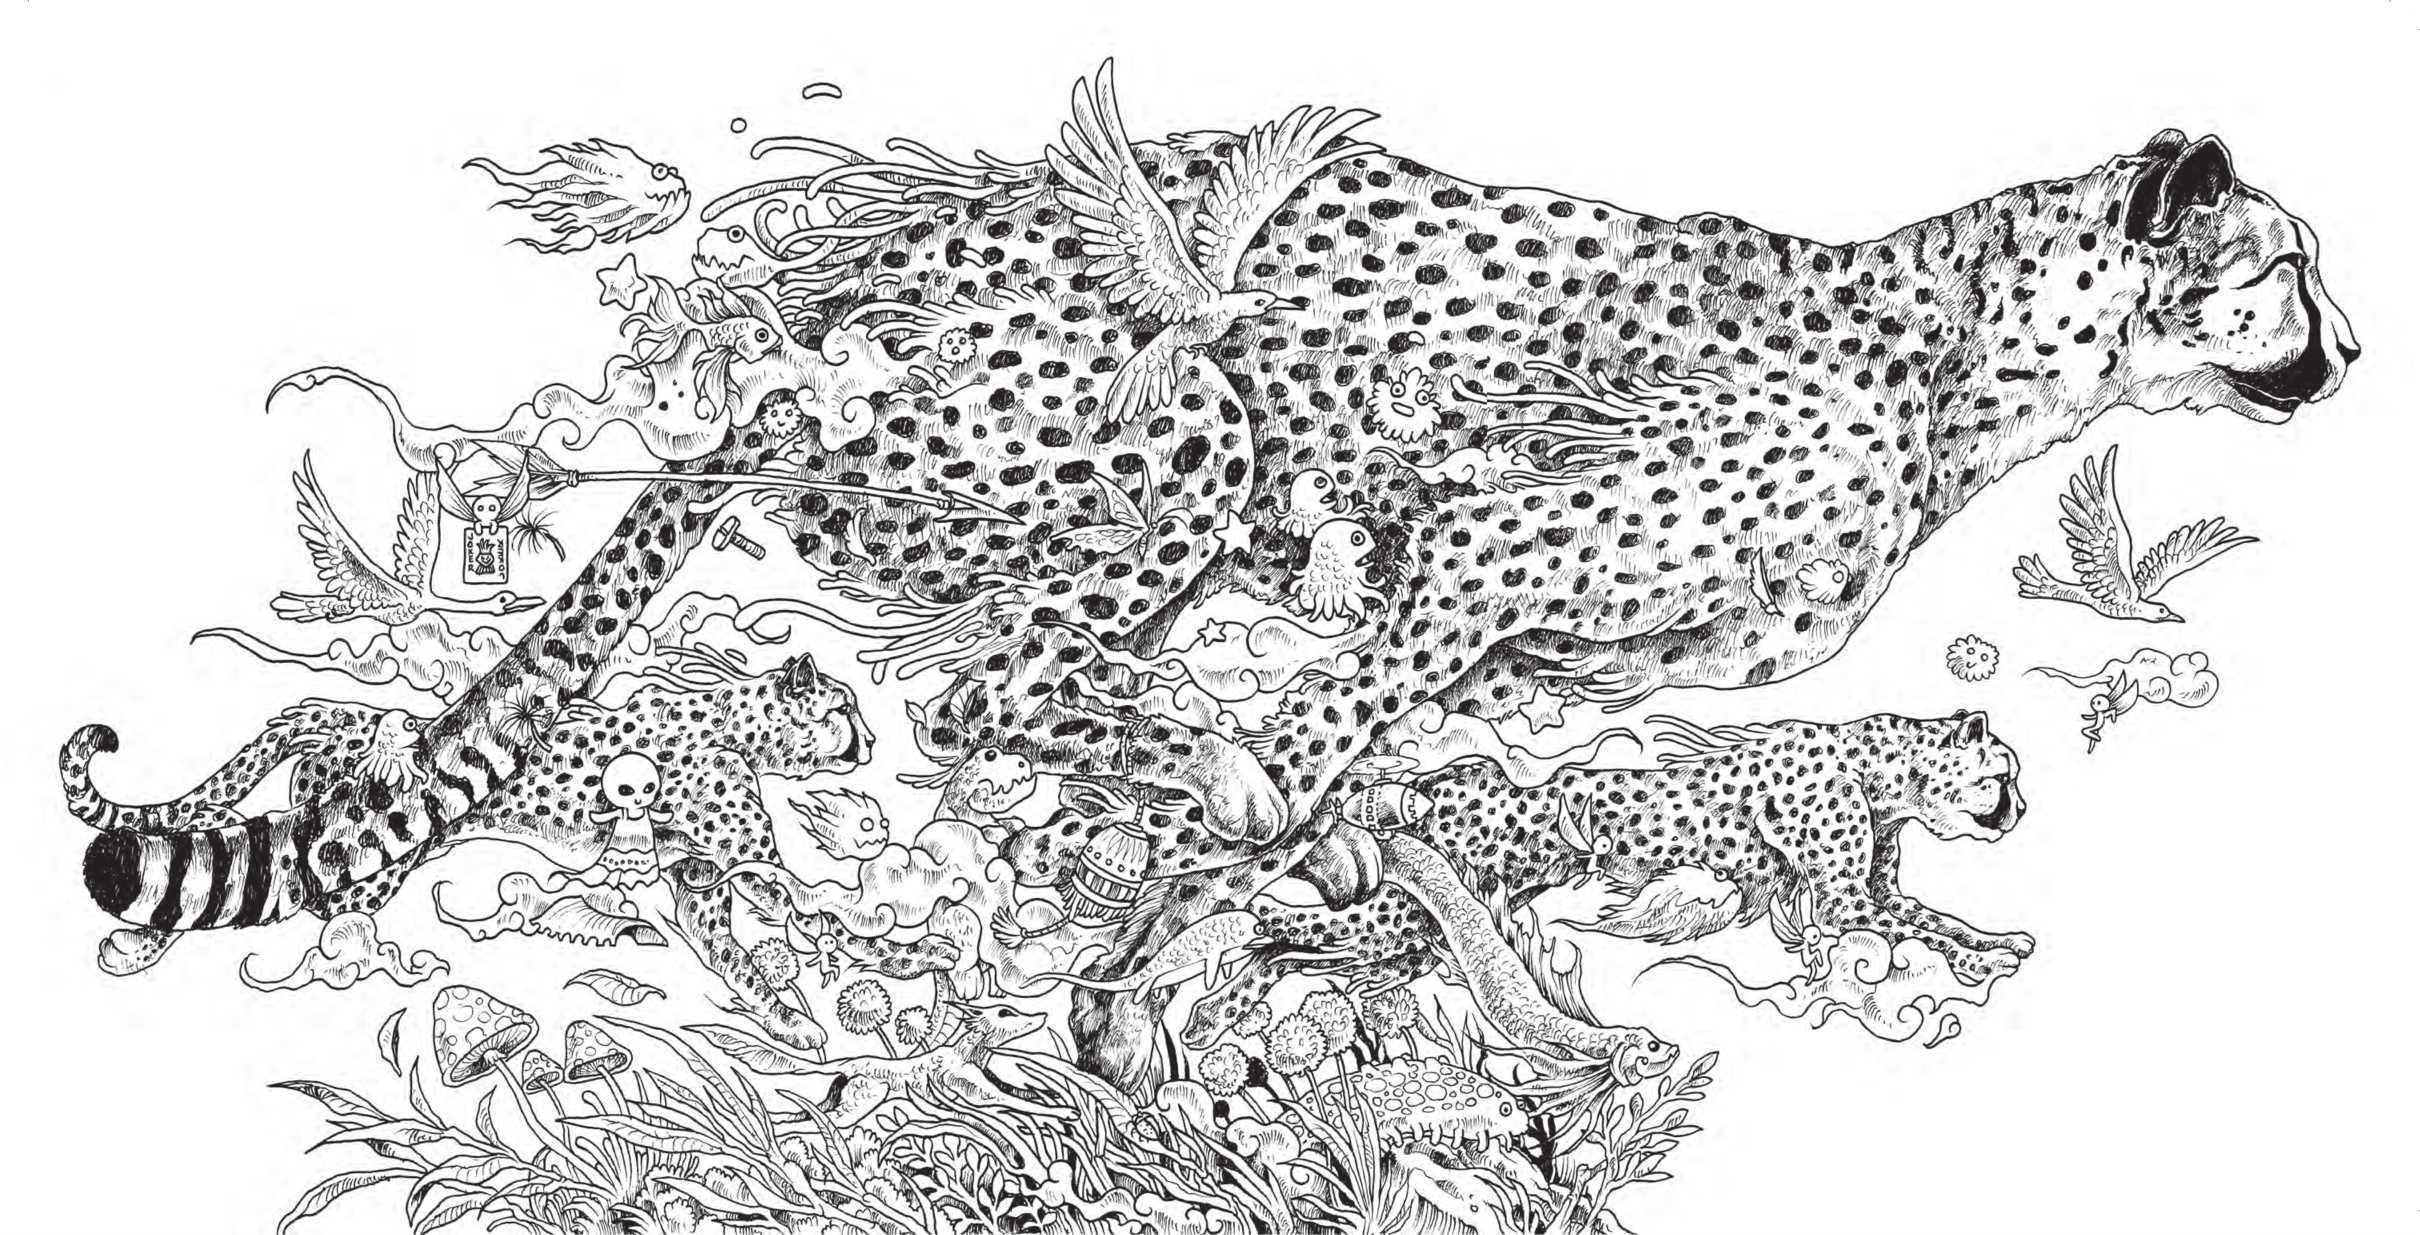 animorphia-cheetah.jpg (2420×1235)